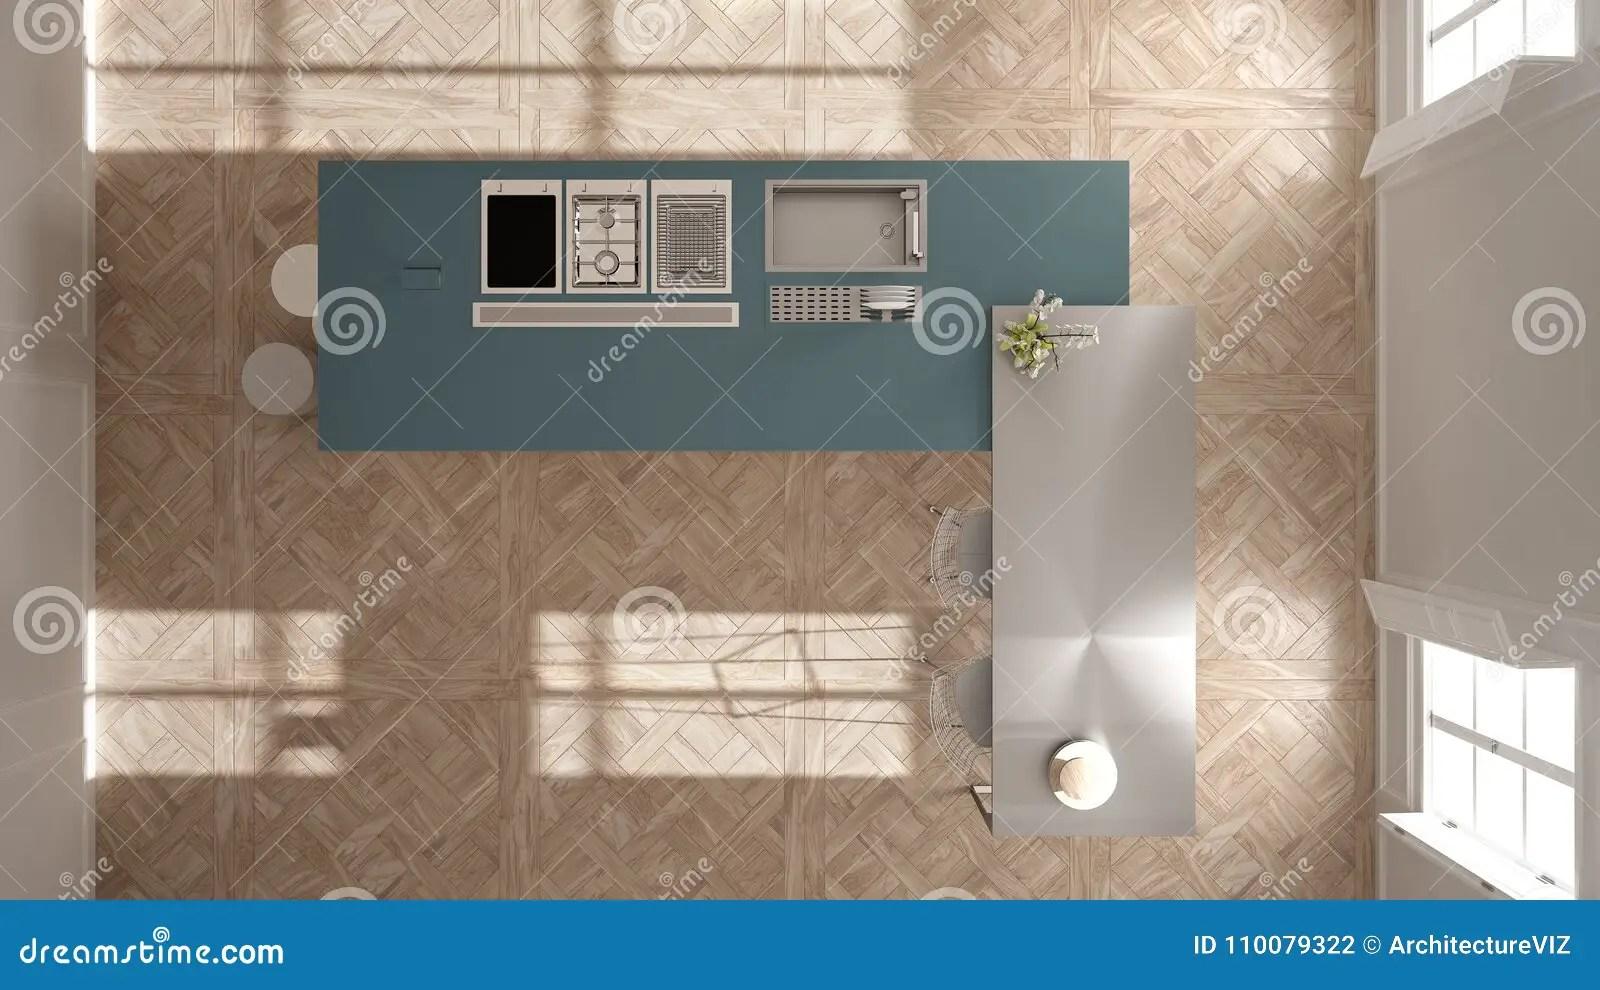 navy blue kitchen decor best backsplash 经典内部的现代有凳子和两的大窗口厨房 海岛 顶视图 白色和蓝色海军 白色和蓝色海军建筑学室内设计